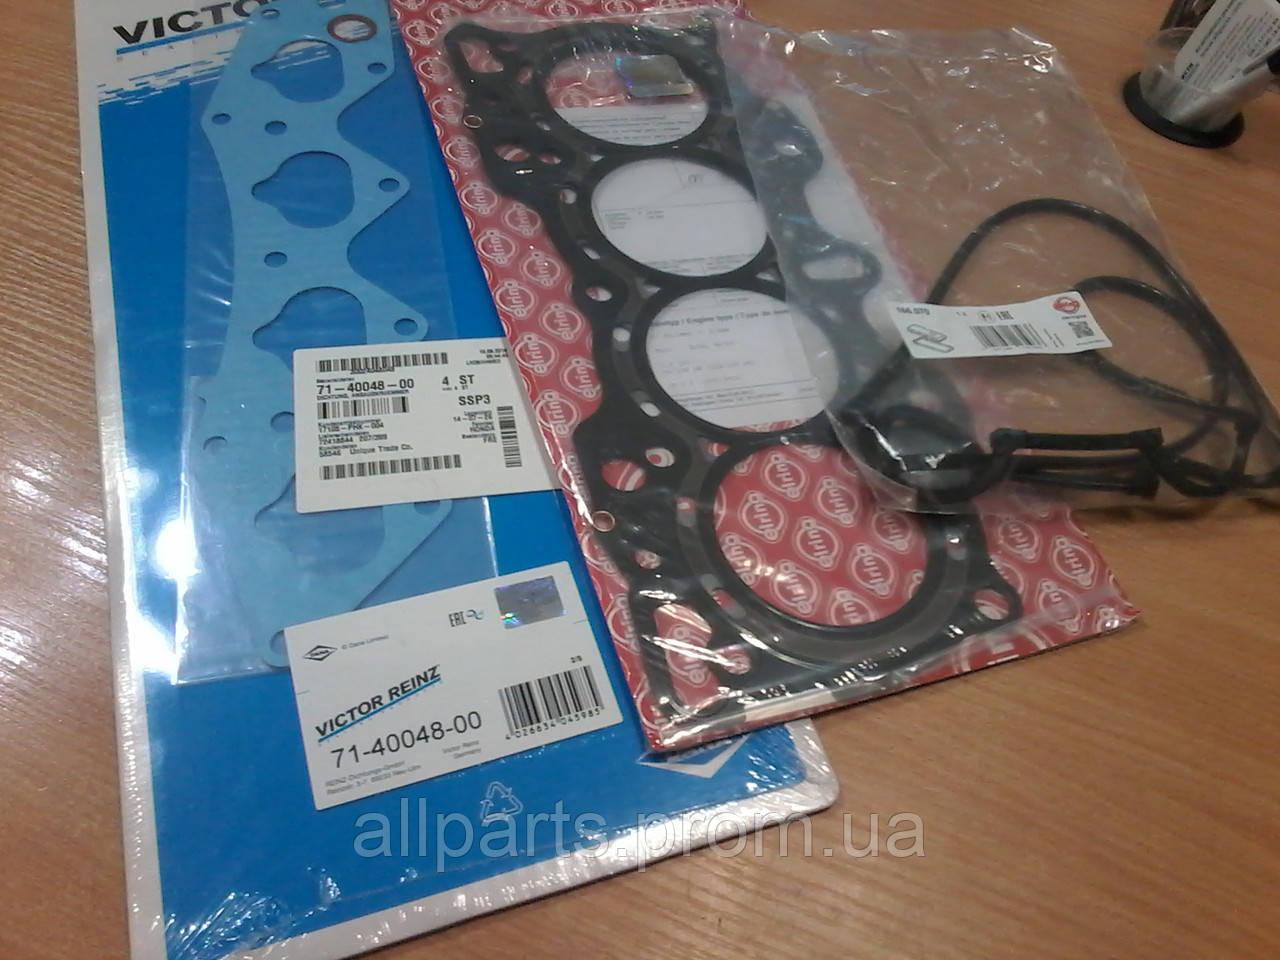 Прокладка головки блока цилиндров ГБЦ клапанной крышки комплект на Сузуки -Suzuki Grand Vitara, SX4,